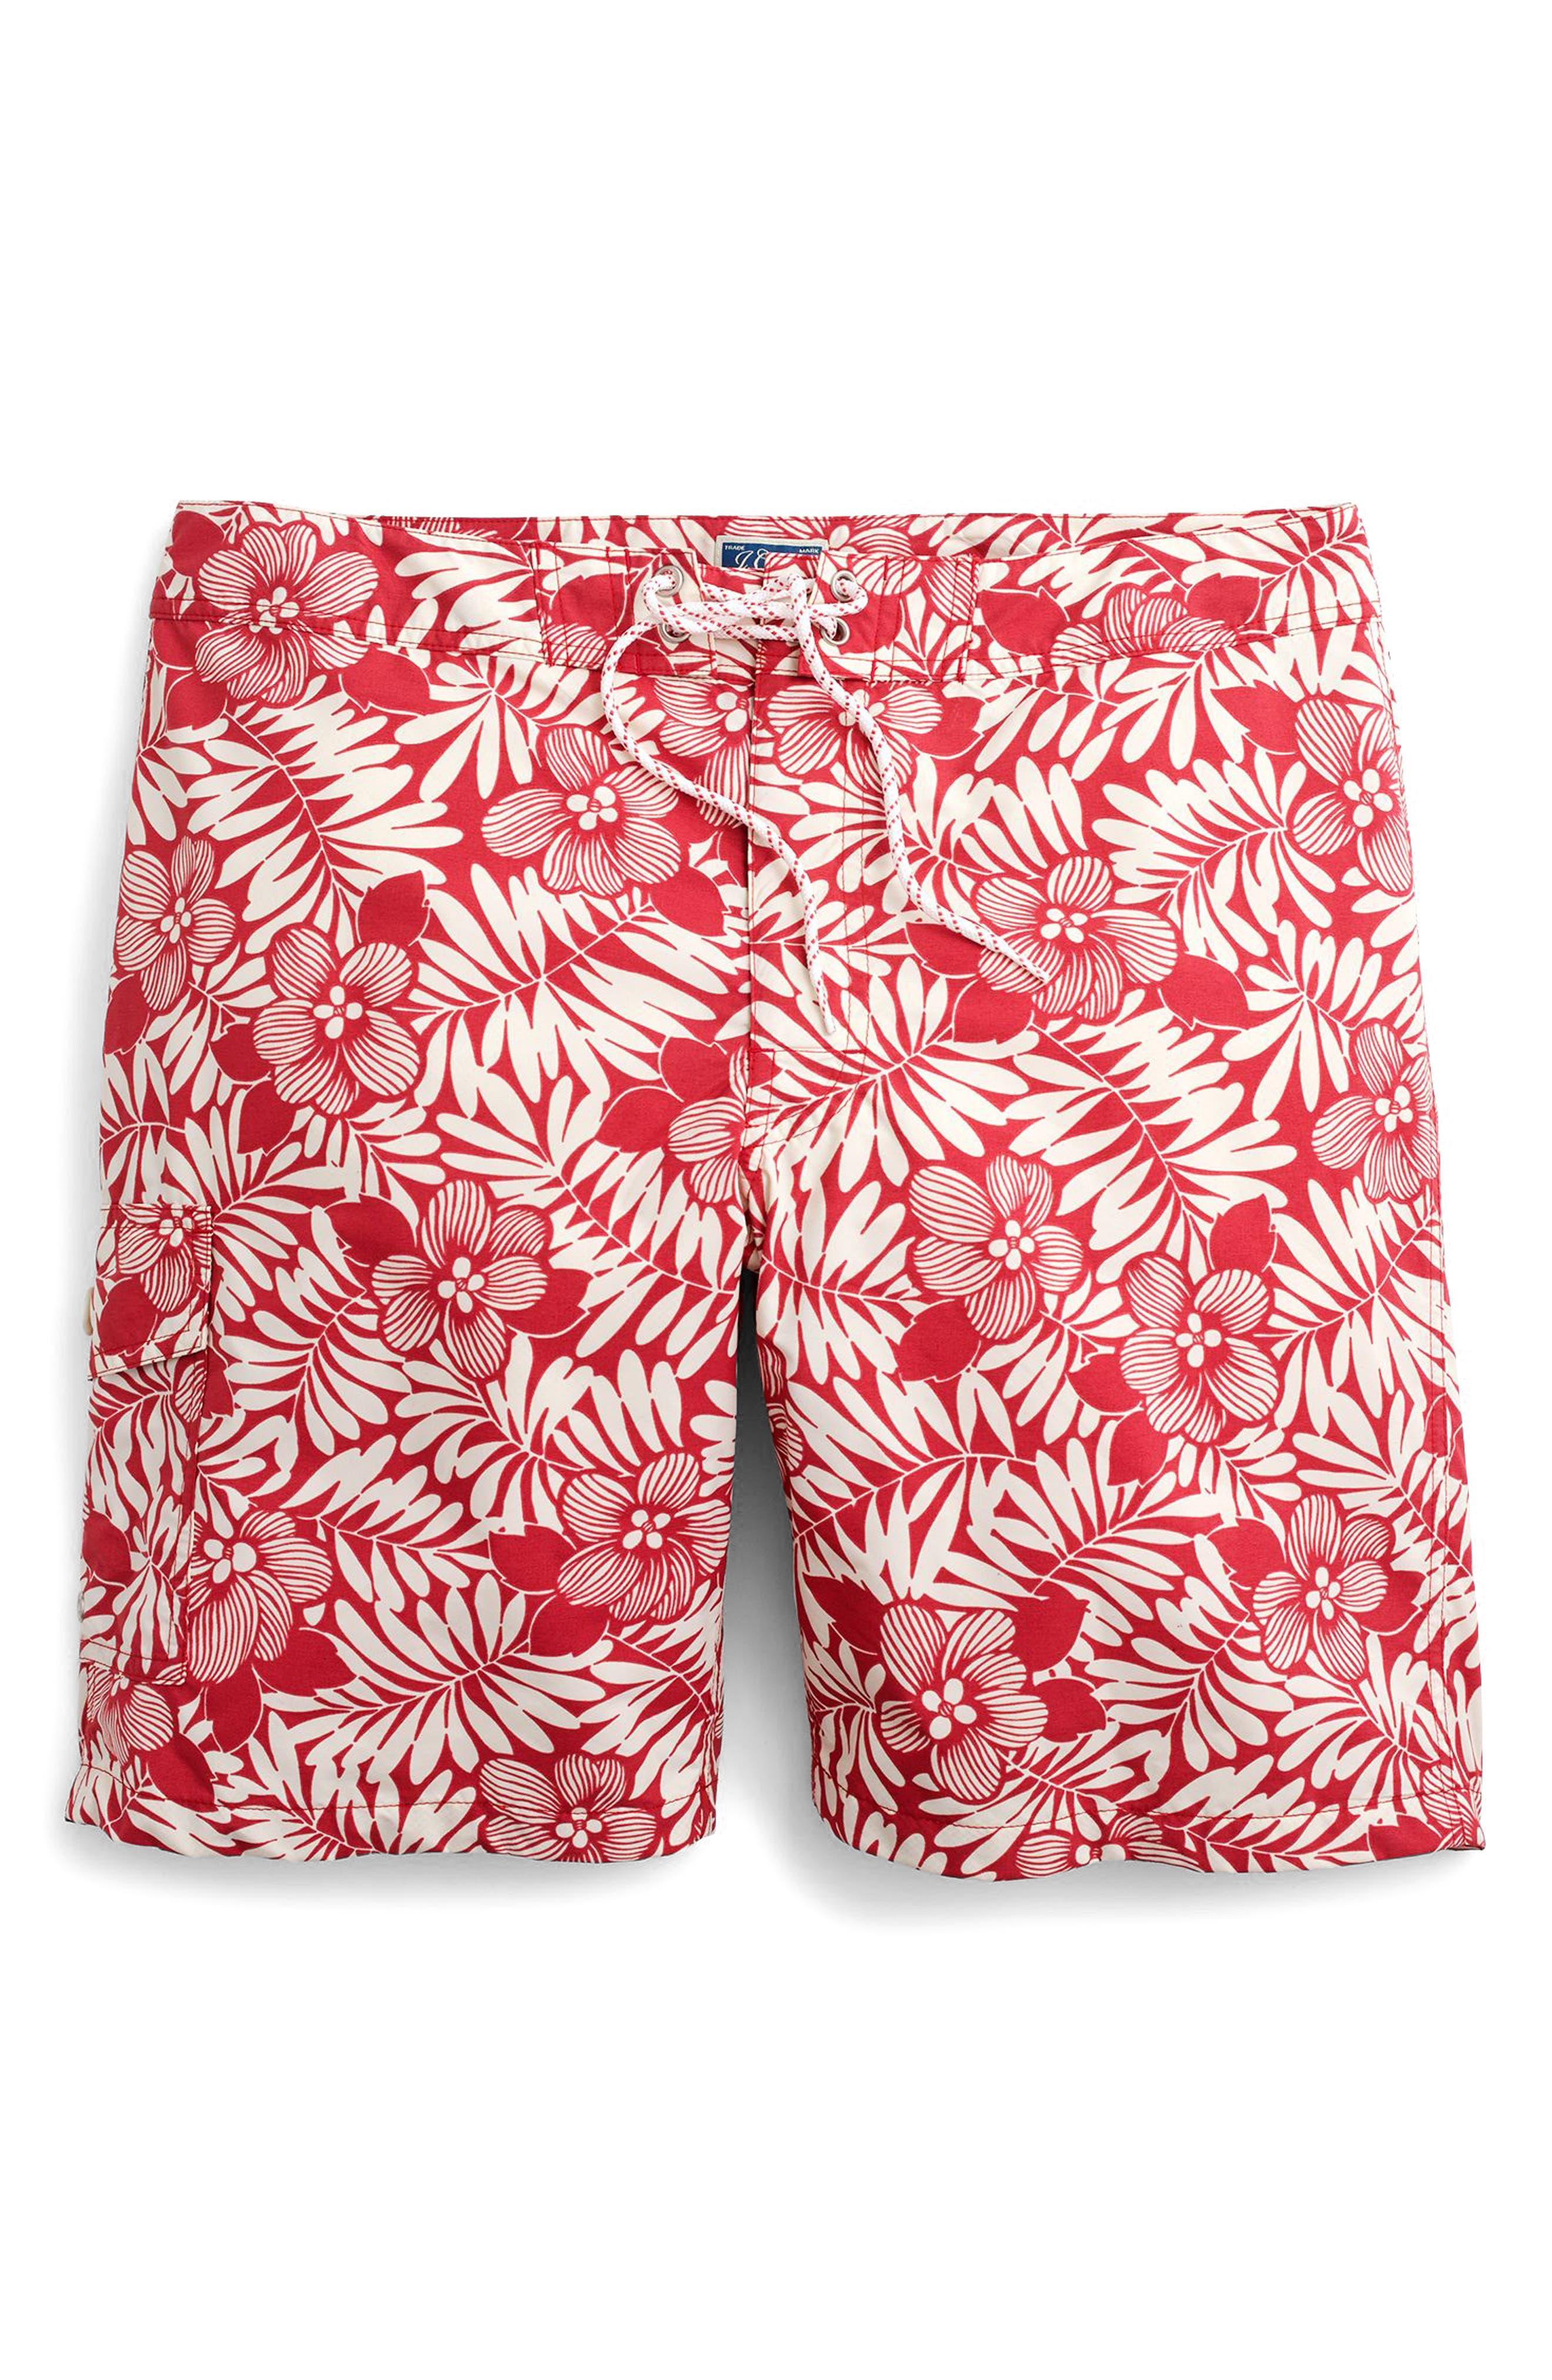 Fern Print Board Shorts,                             Alternate thumbnail 3, color,                             610